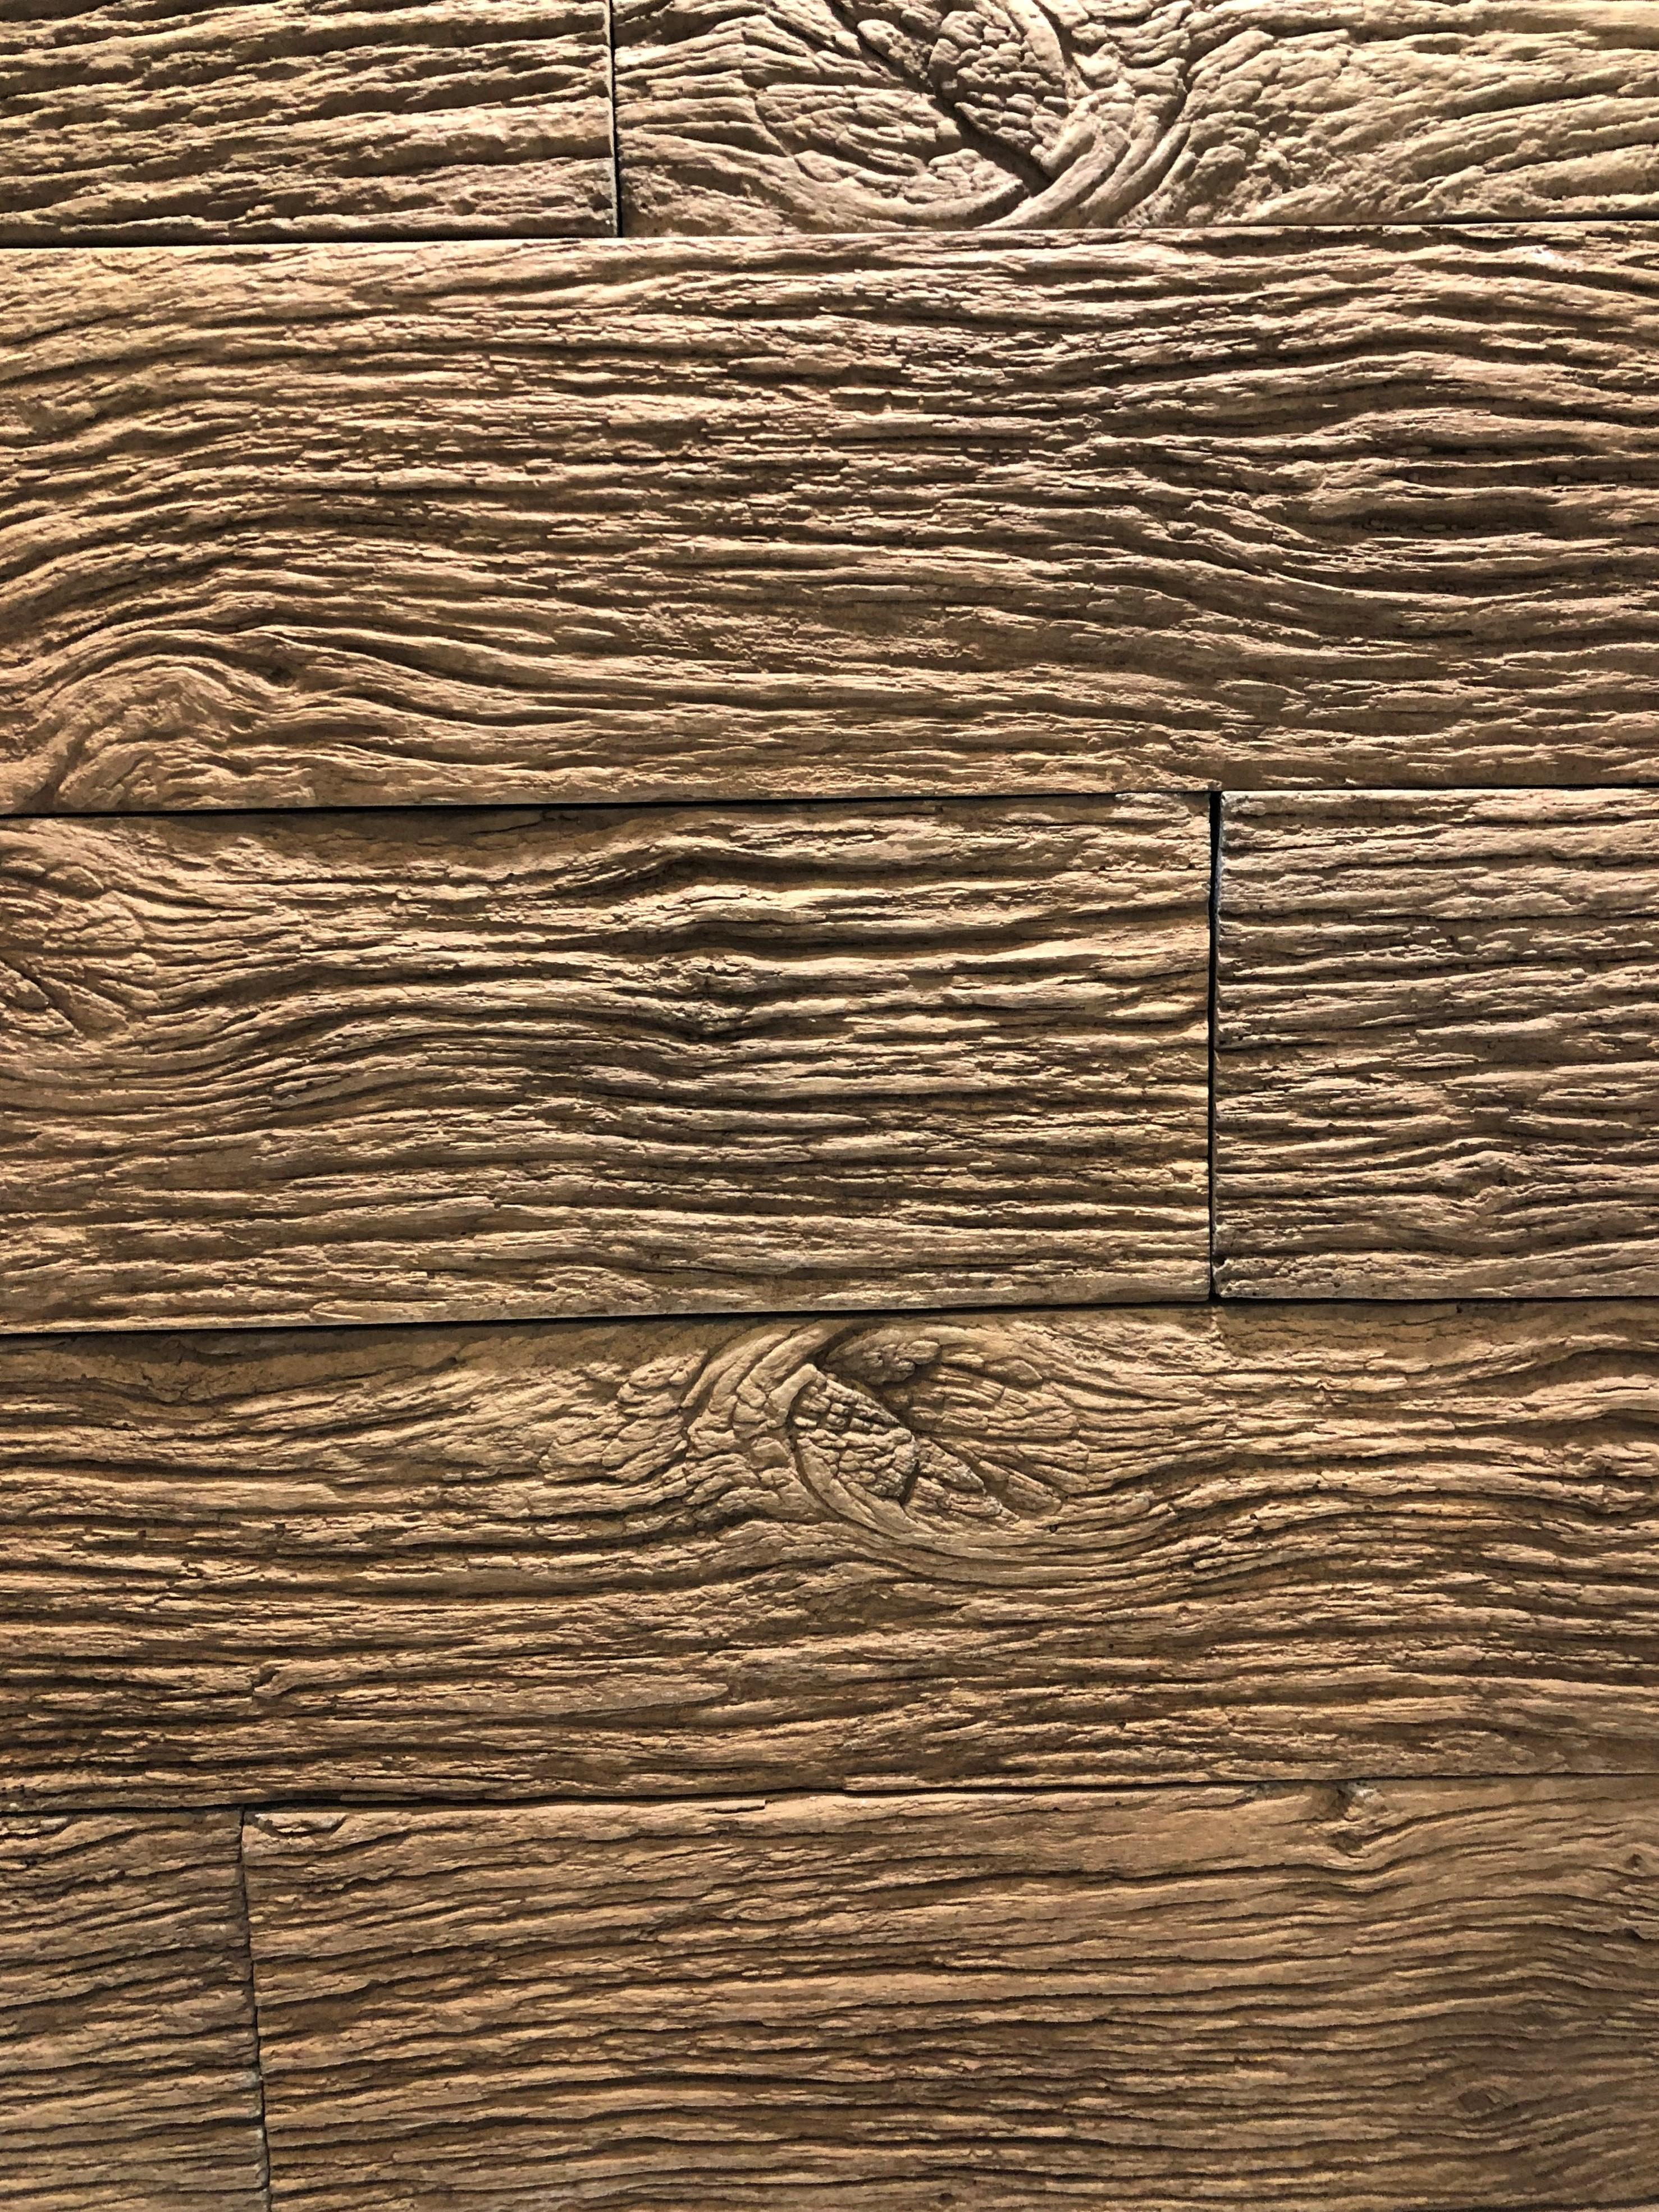 Environmental Stoneworks Develops Barn Wood Stone Veneer